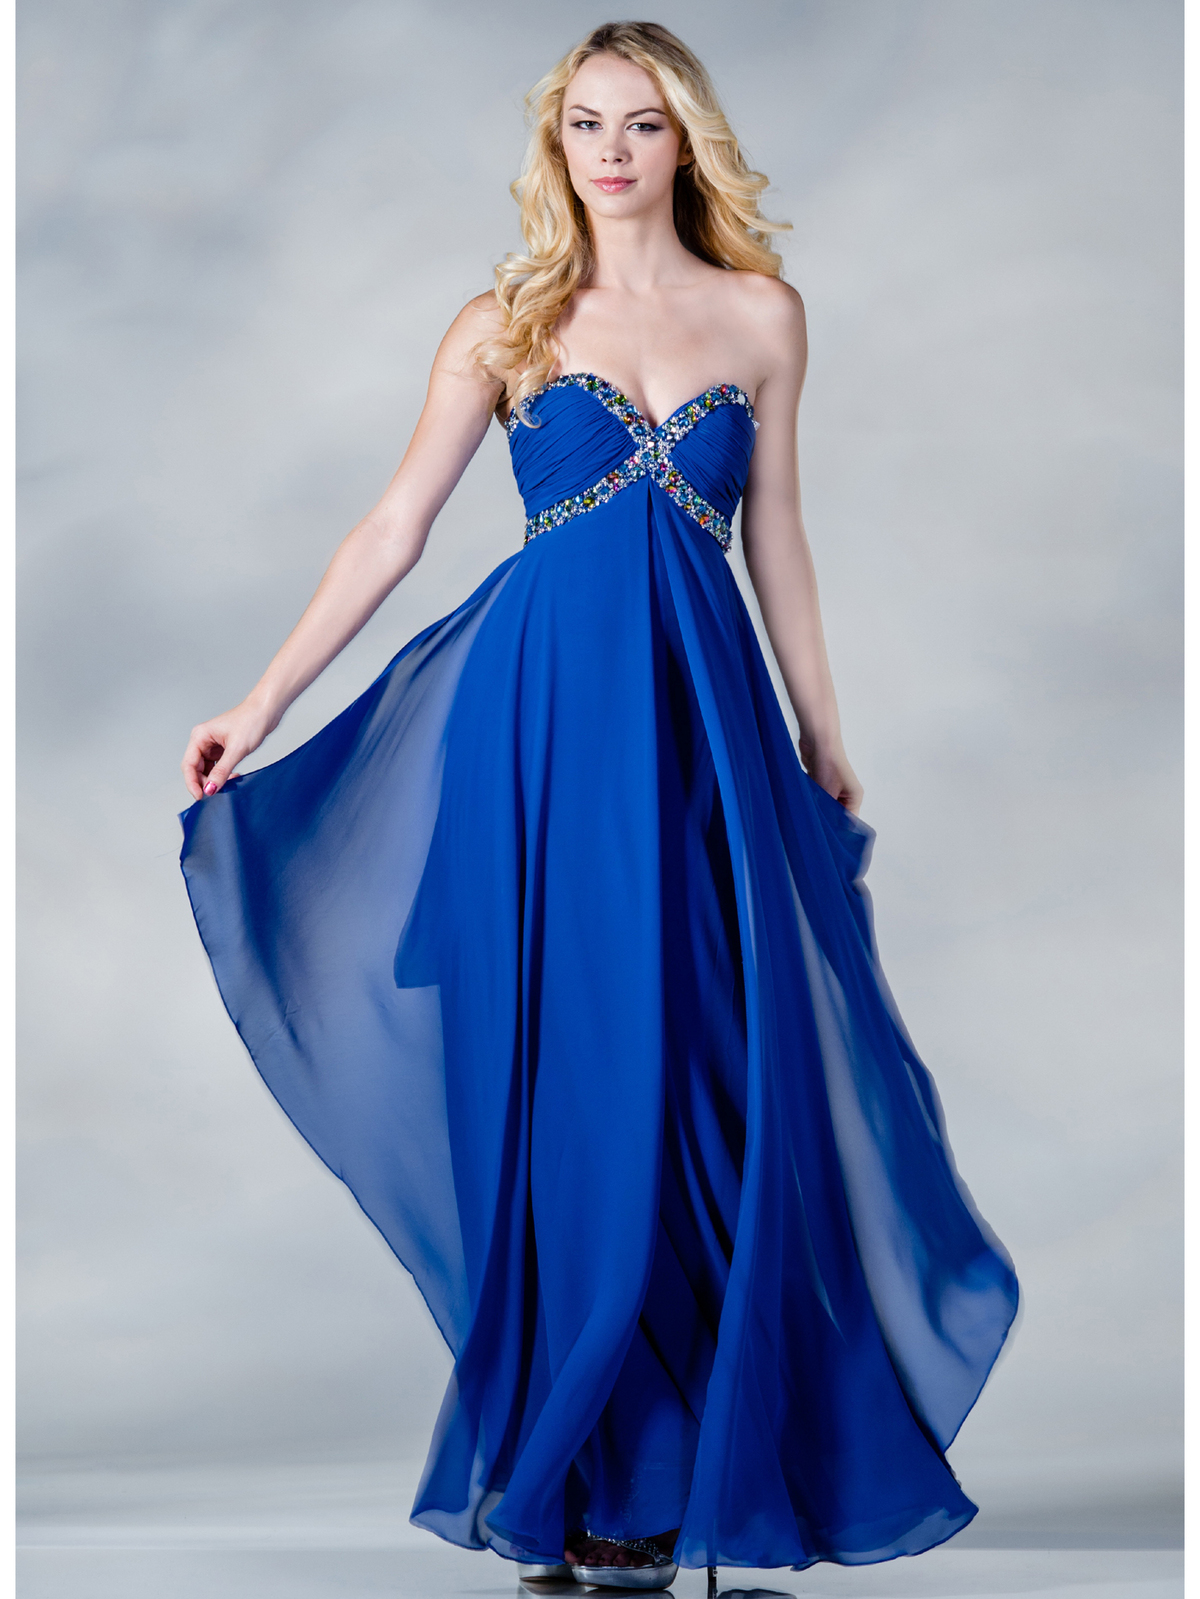 BLUE PROM DRESS - Kalsene Fede